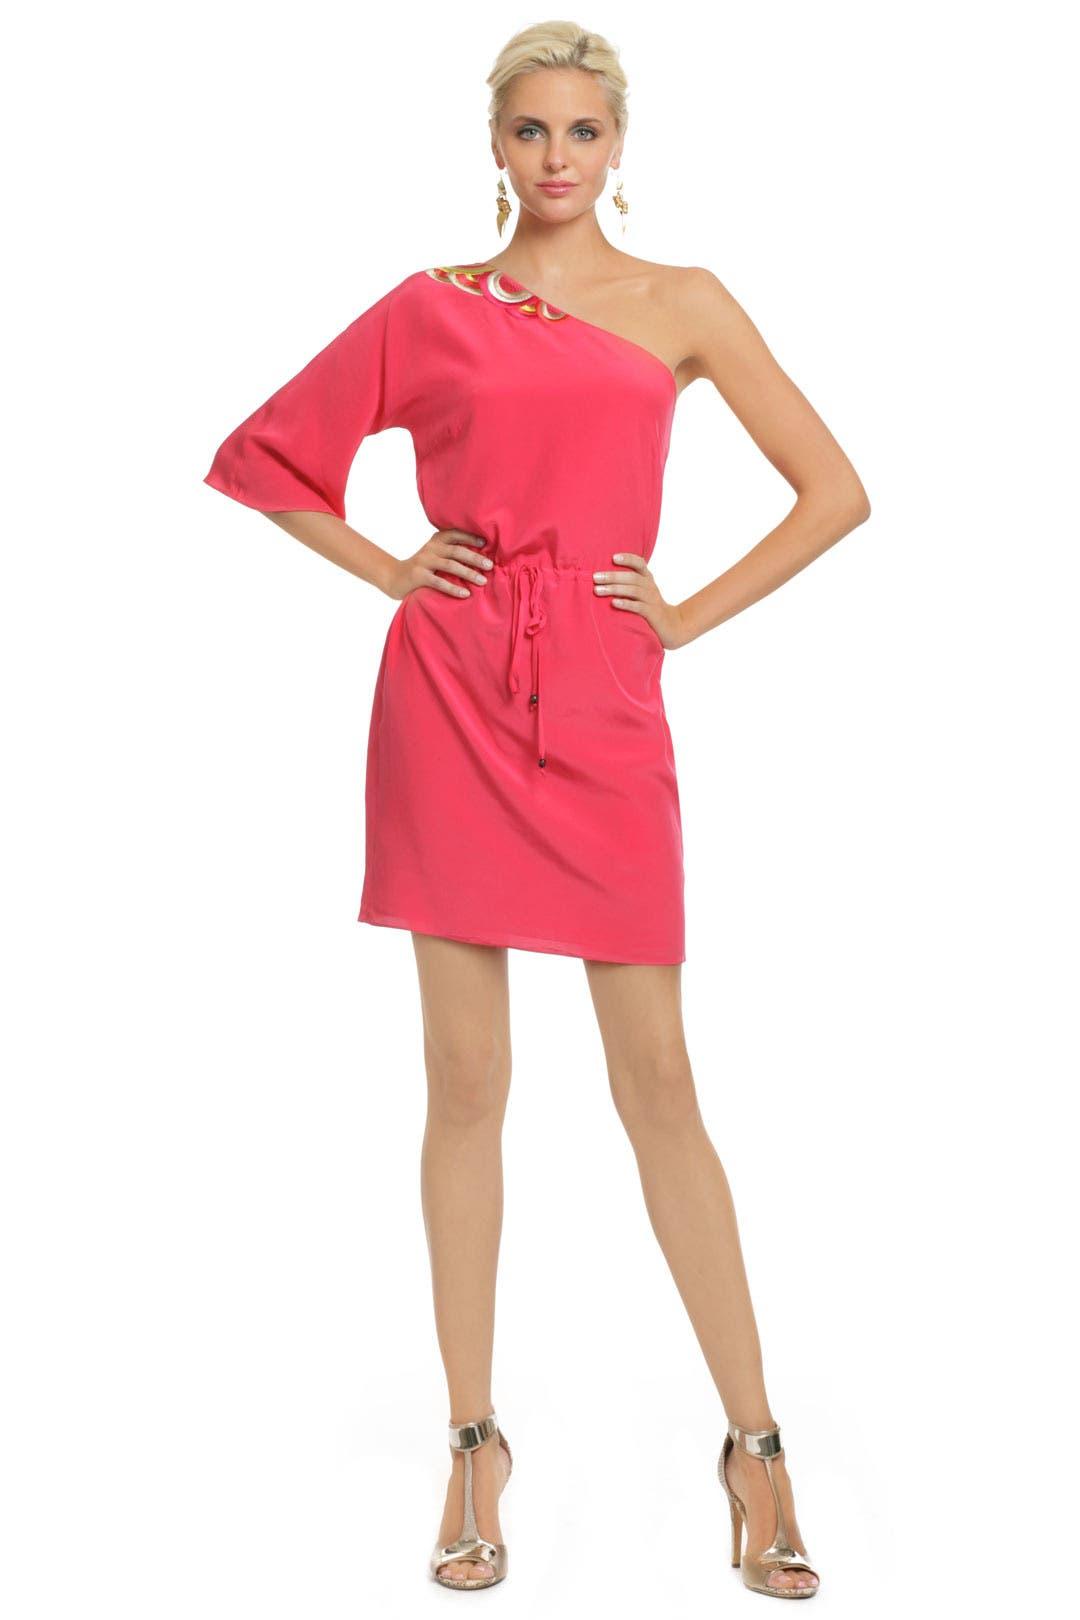 Coral Santa Cruz Sun Dress by Trina Turk